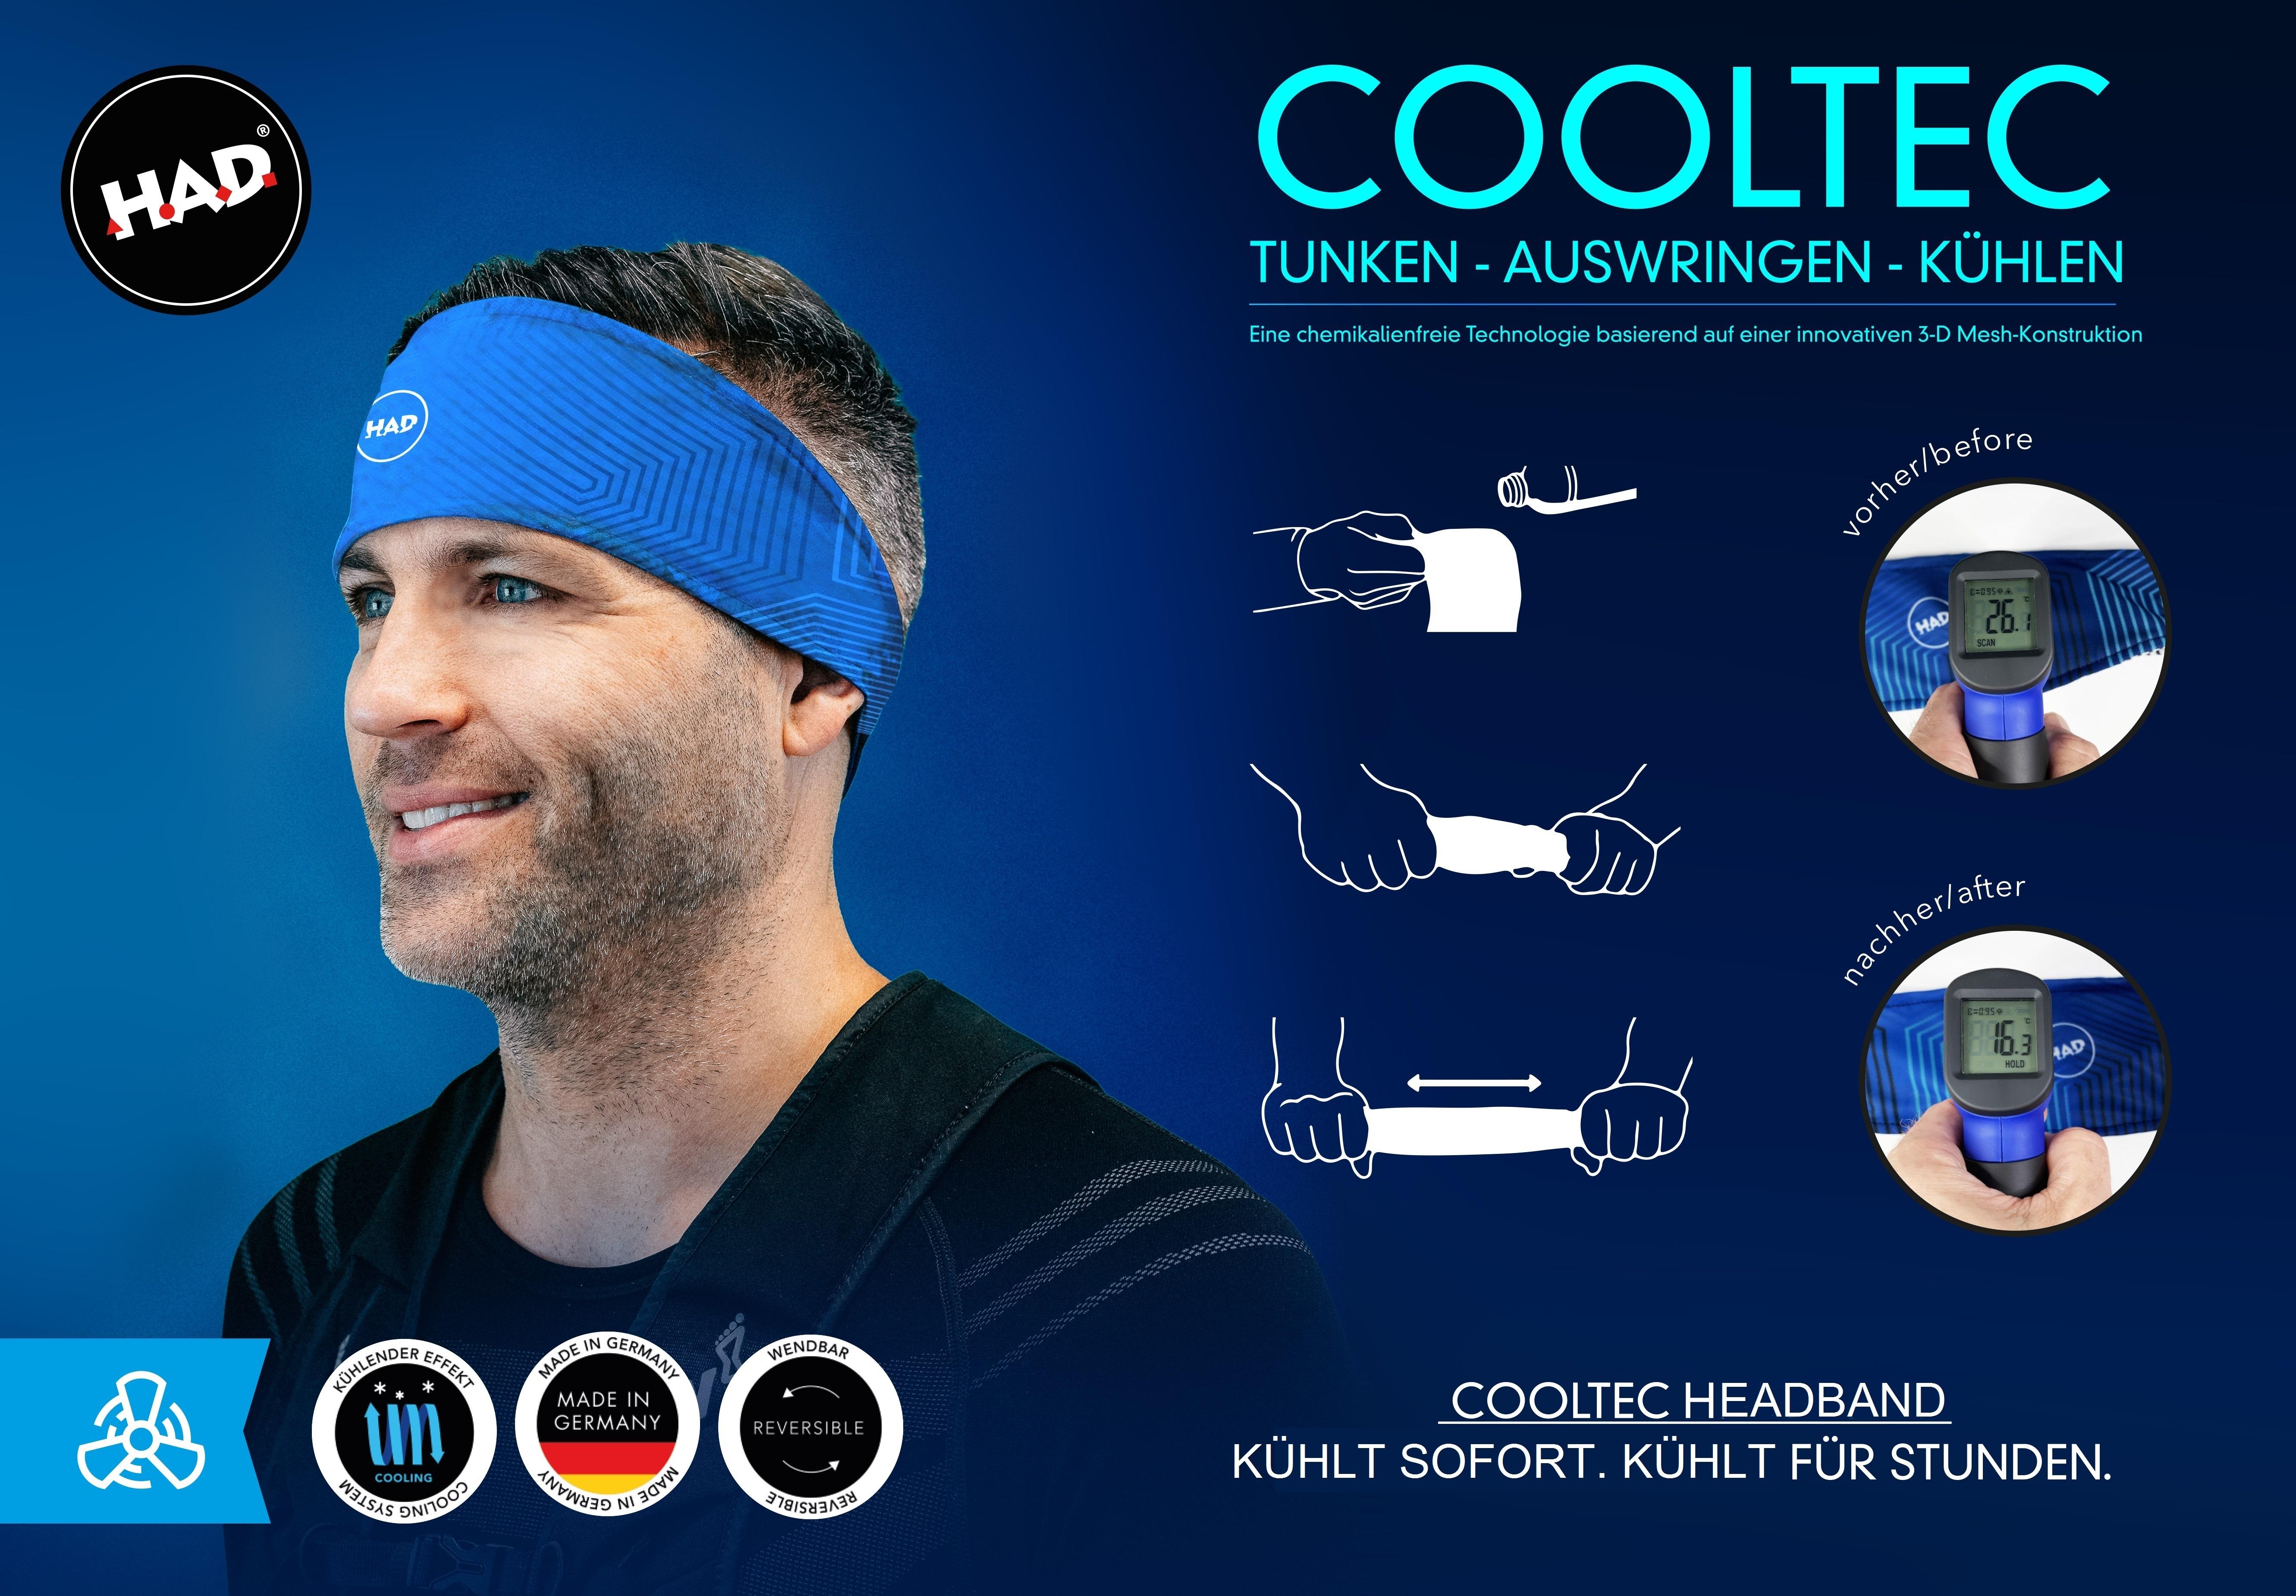 Cooltec Headband